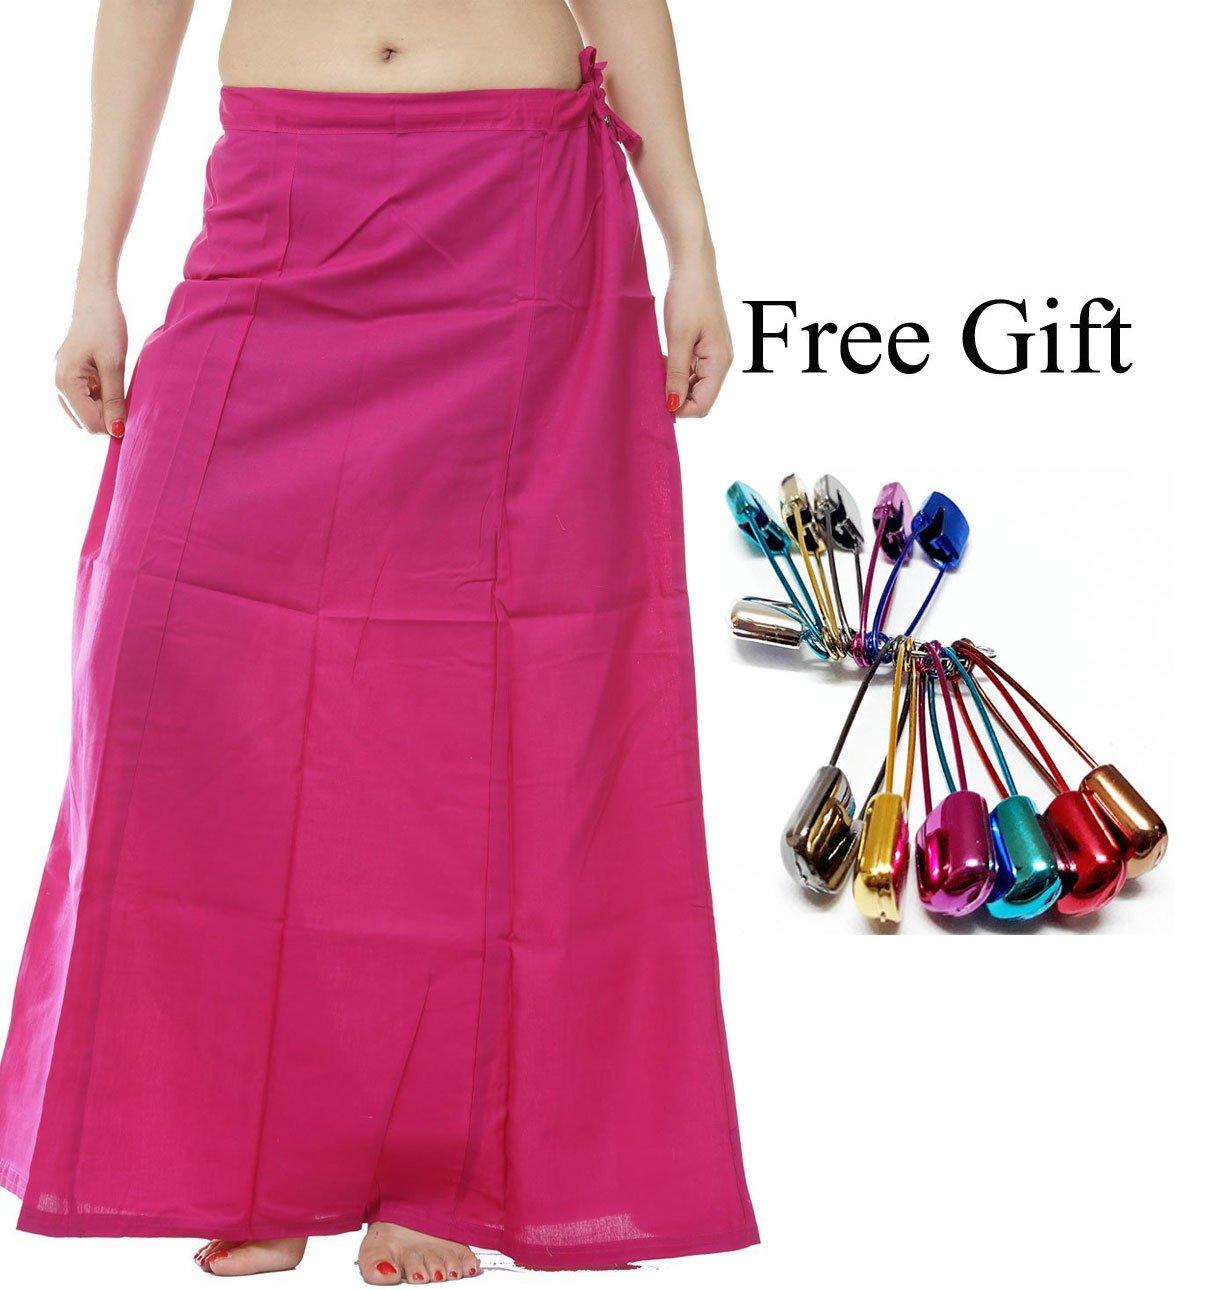 Odishabazaar Women Saree Petticoat Cotton Underskirt Lining For Sari + Free Sari Pin (Hot Pink)